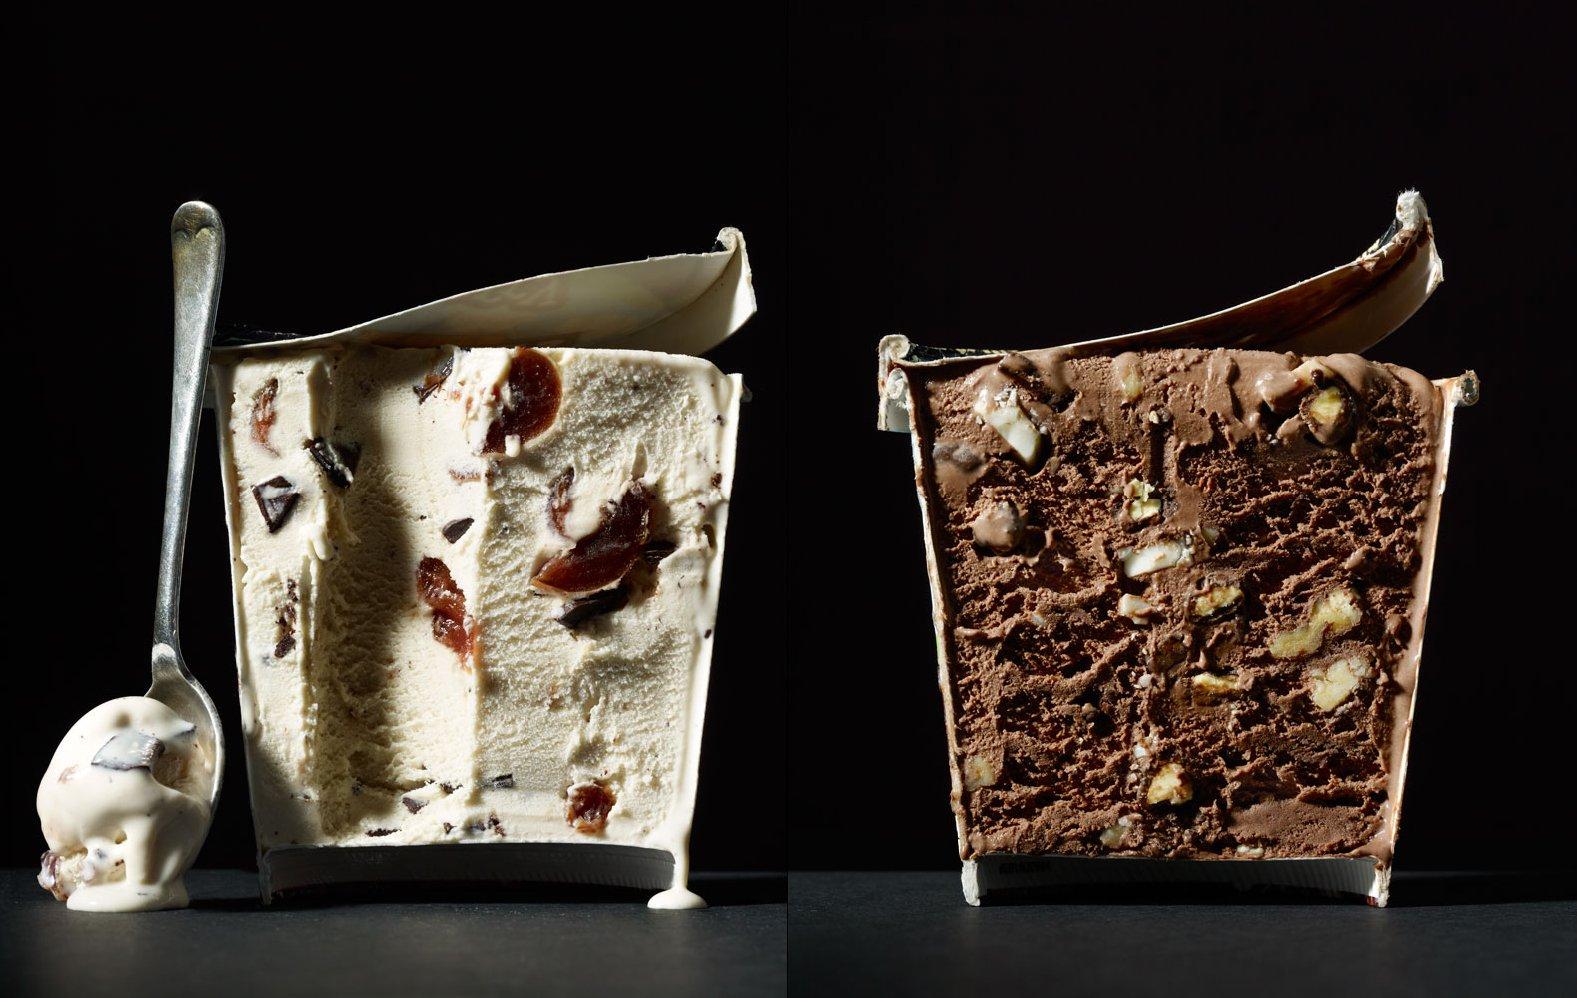 Ice cream. Photo: Courtesy of Beth Galton